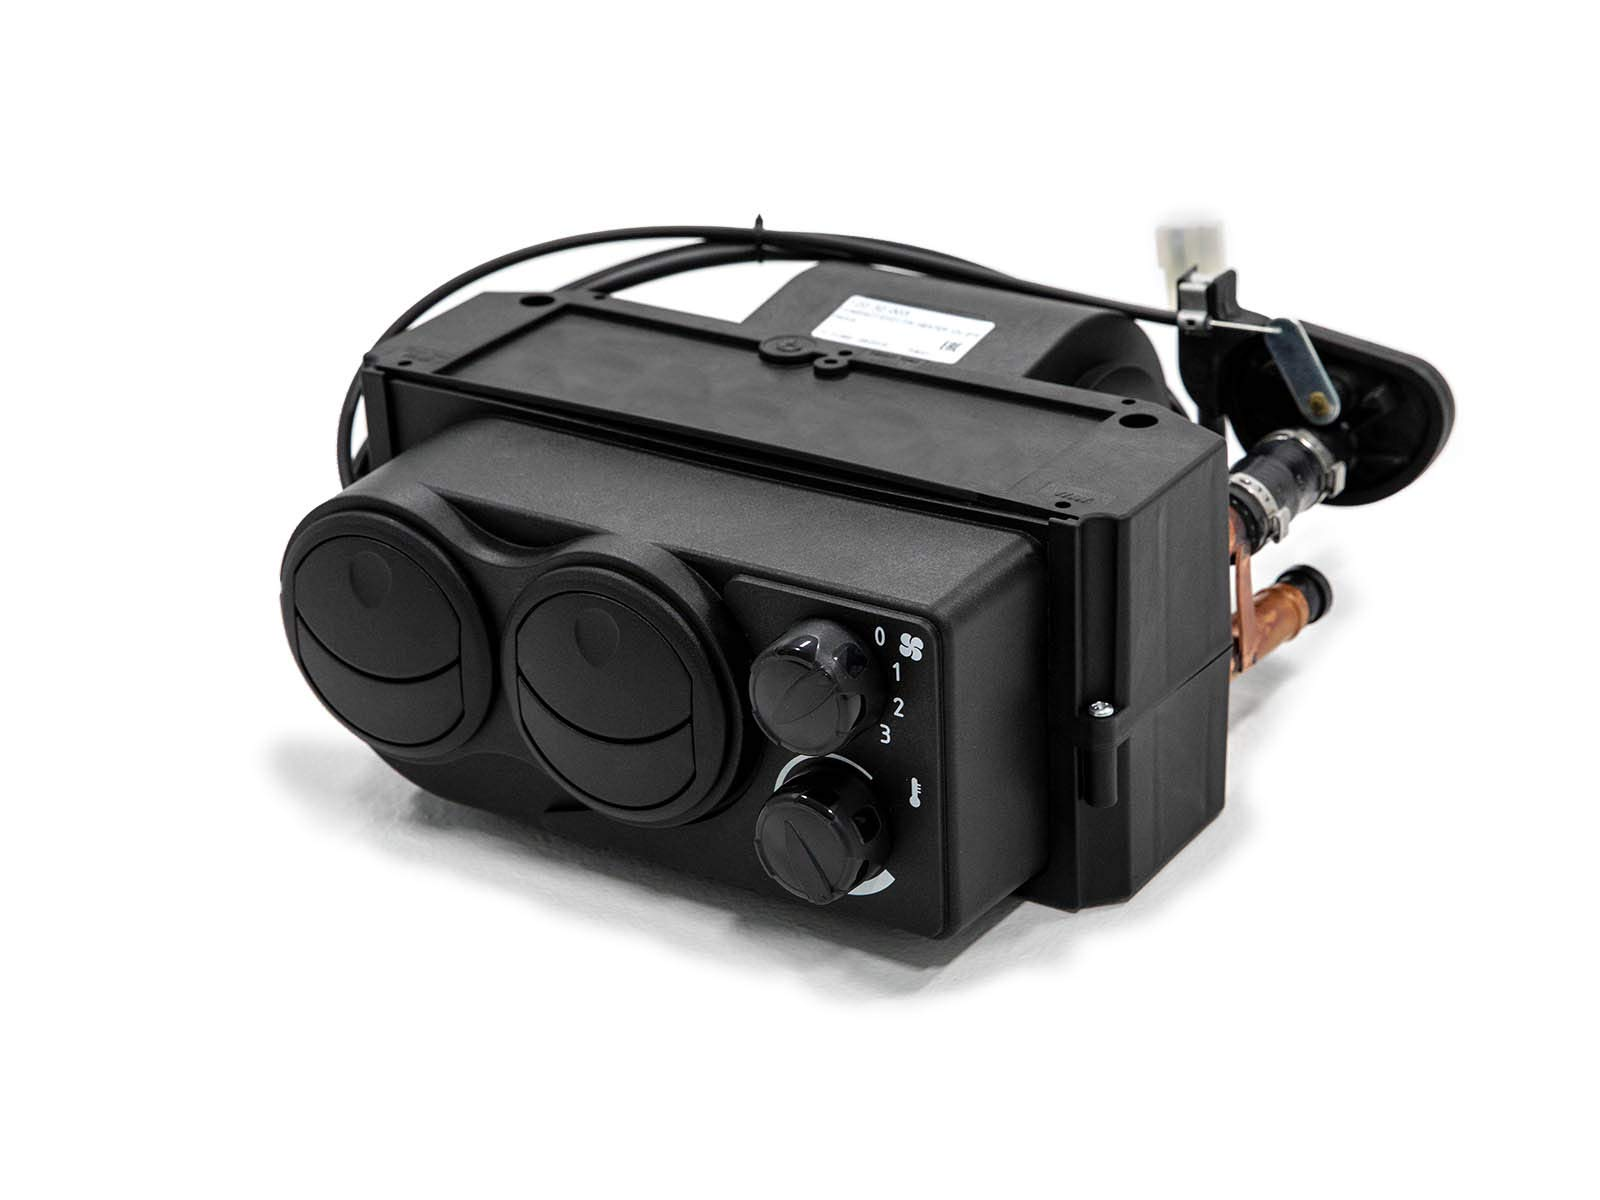 SuperATV Cab Heater for Can-Am Defender HD 5/8 / 10 / MAX (2016+) - Adjustable Temperature & Fan Speeds!